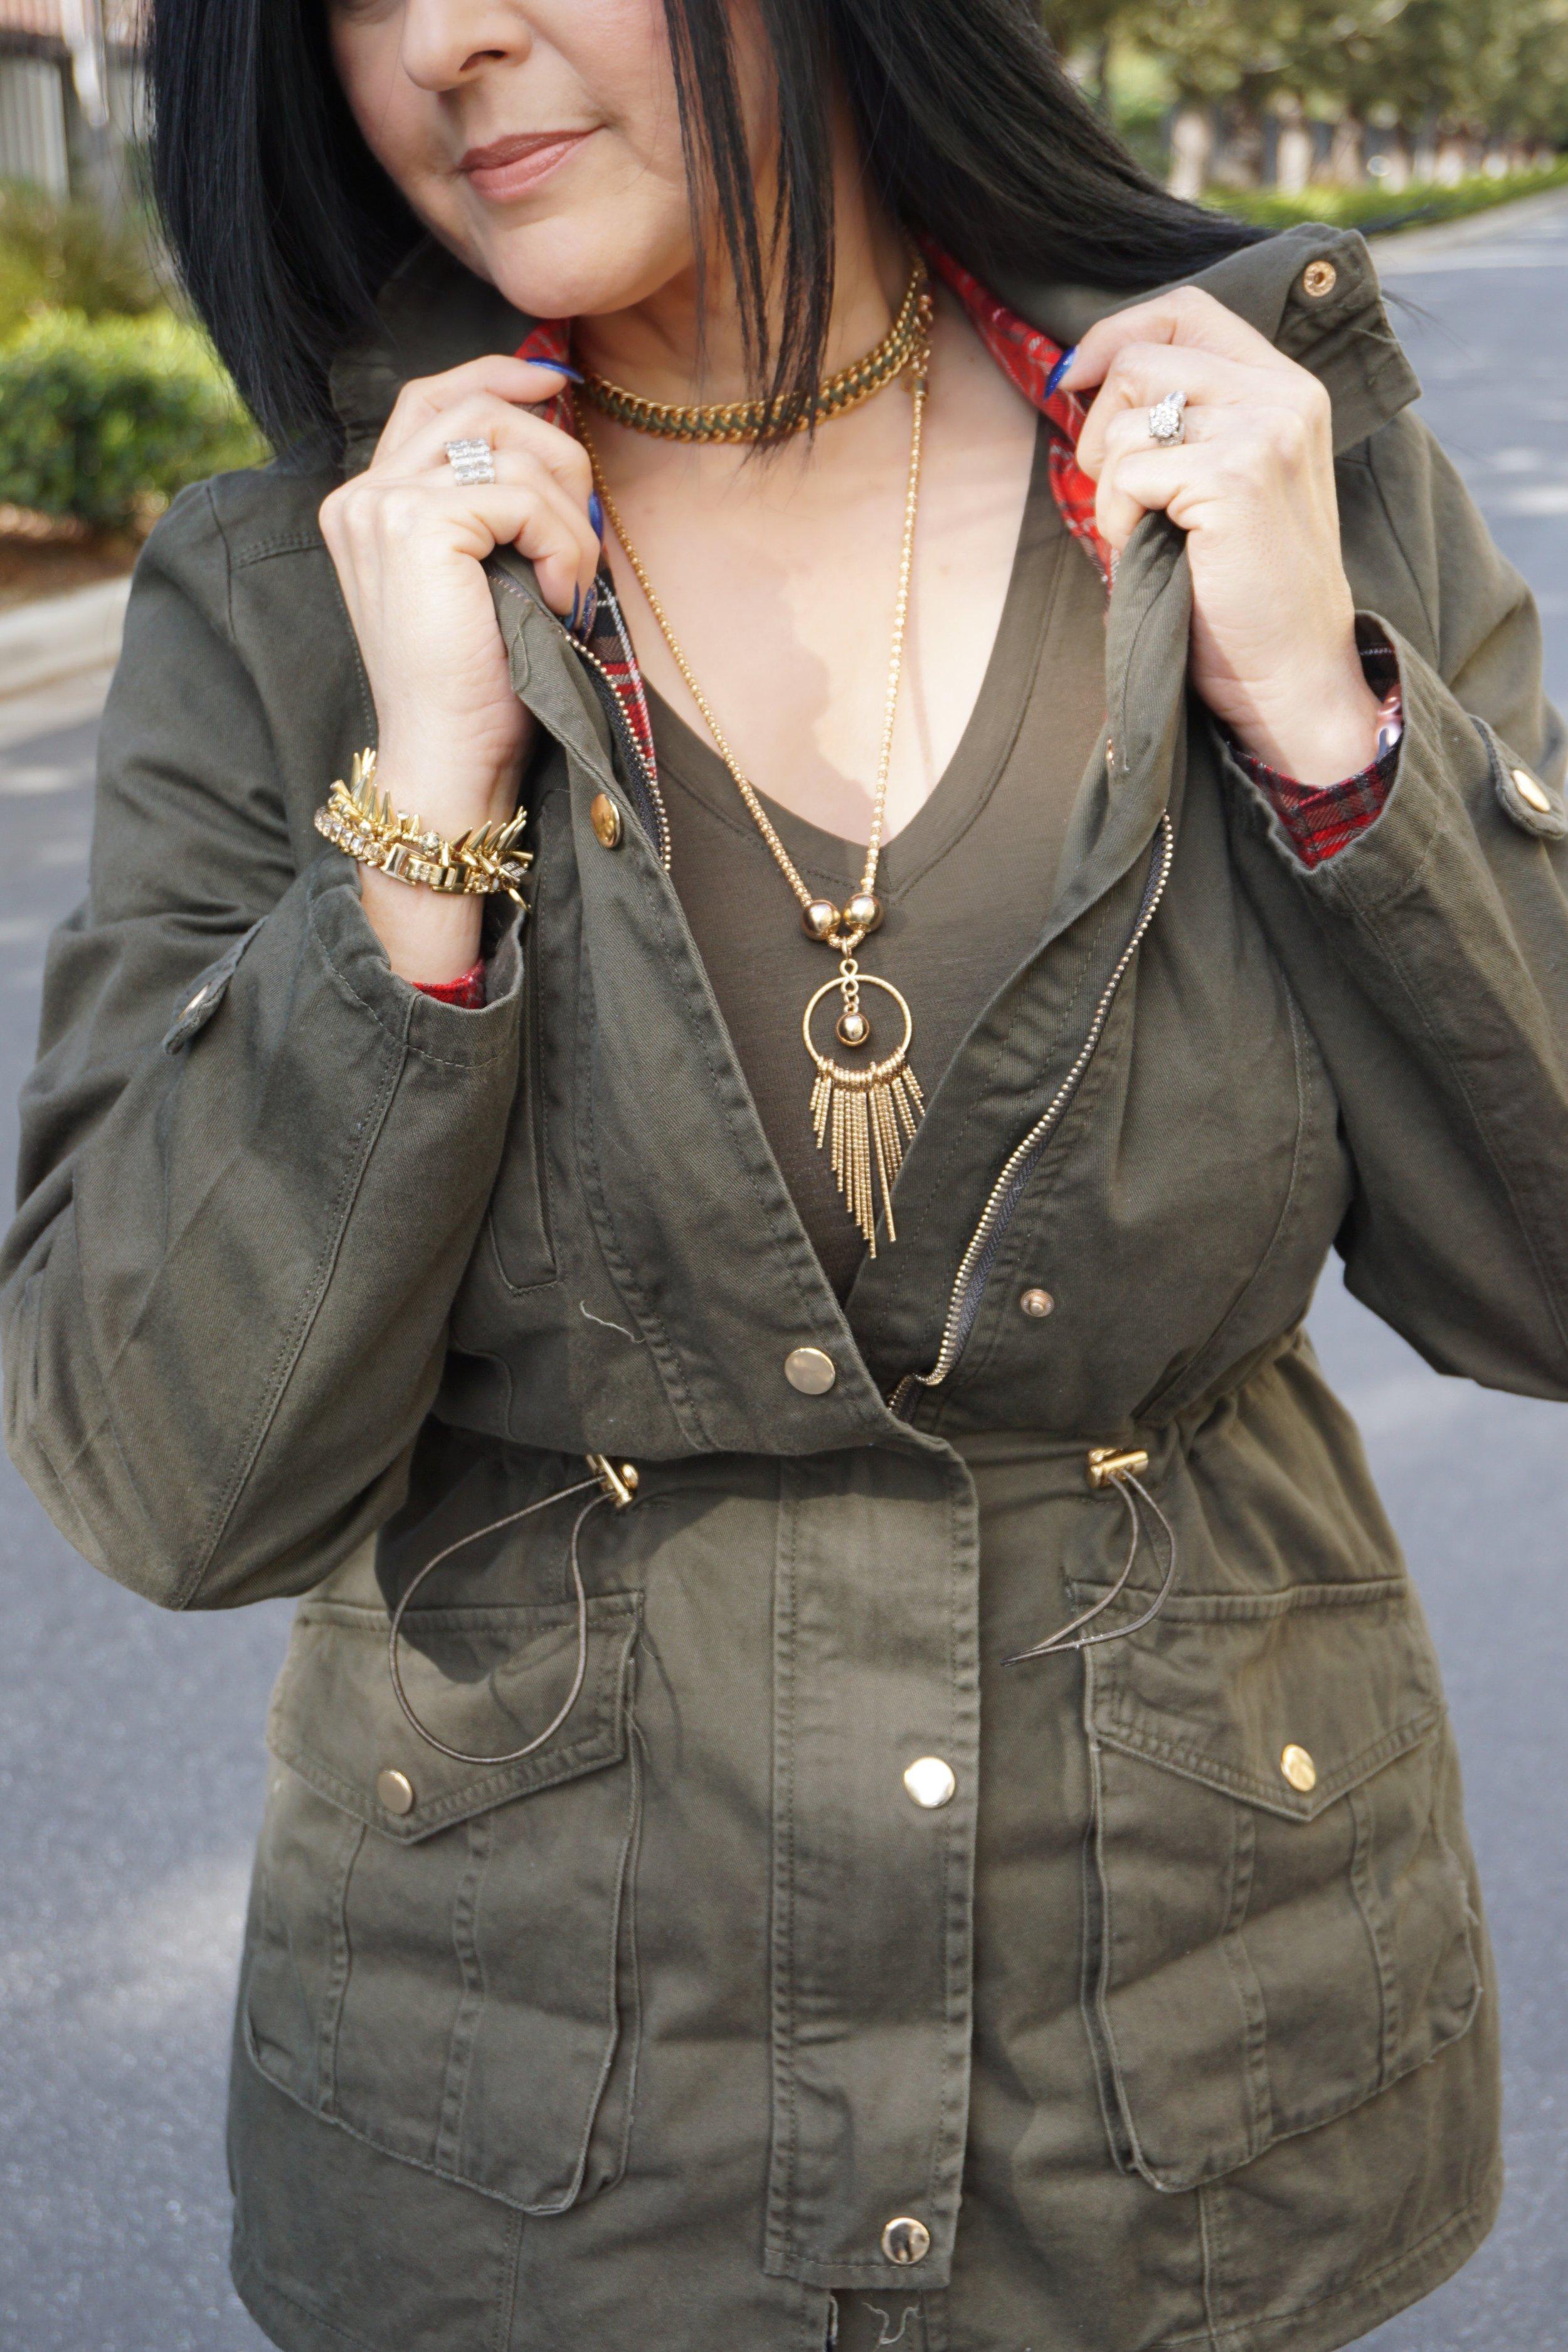 Long necklace is available at / Choker Henri Bendel - Sold Out / Spike Bracelet - Kinsley Armelle